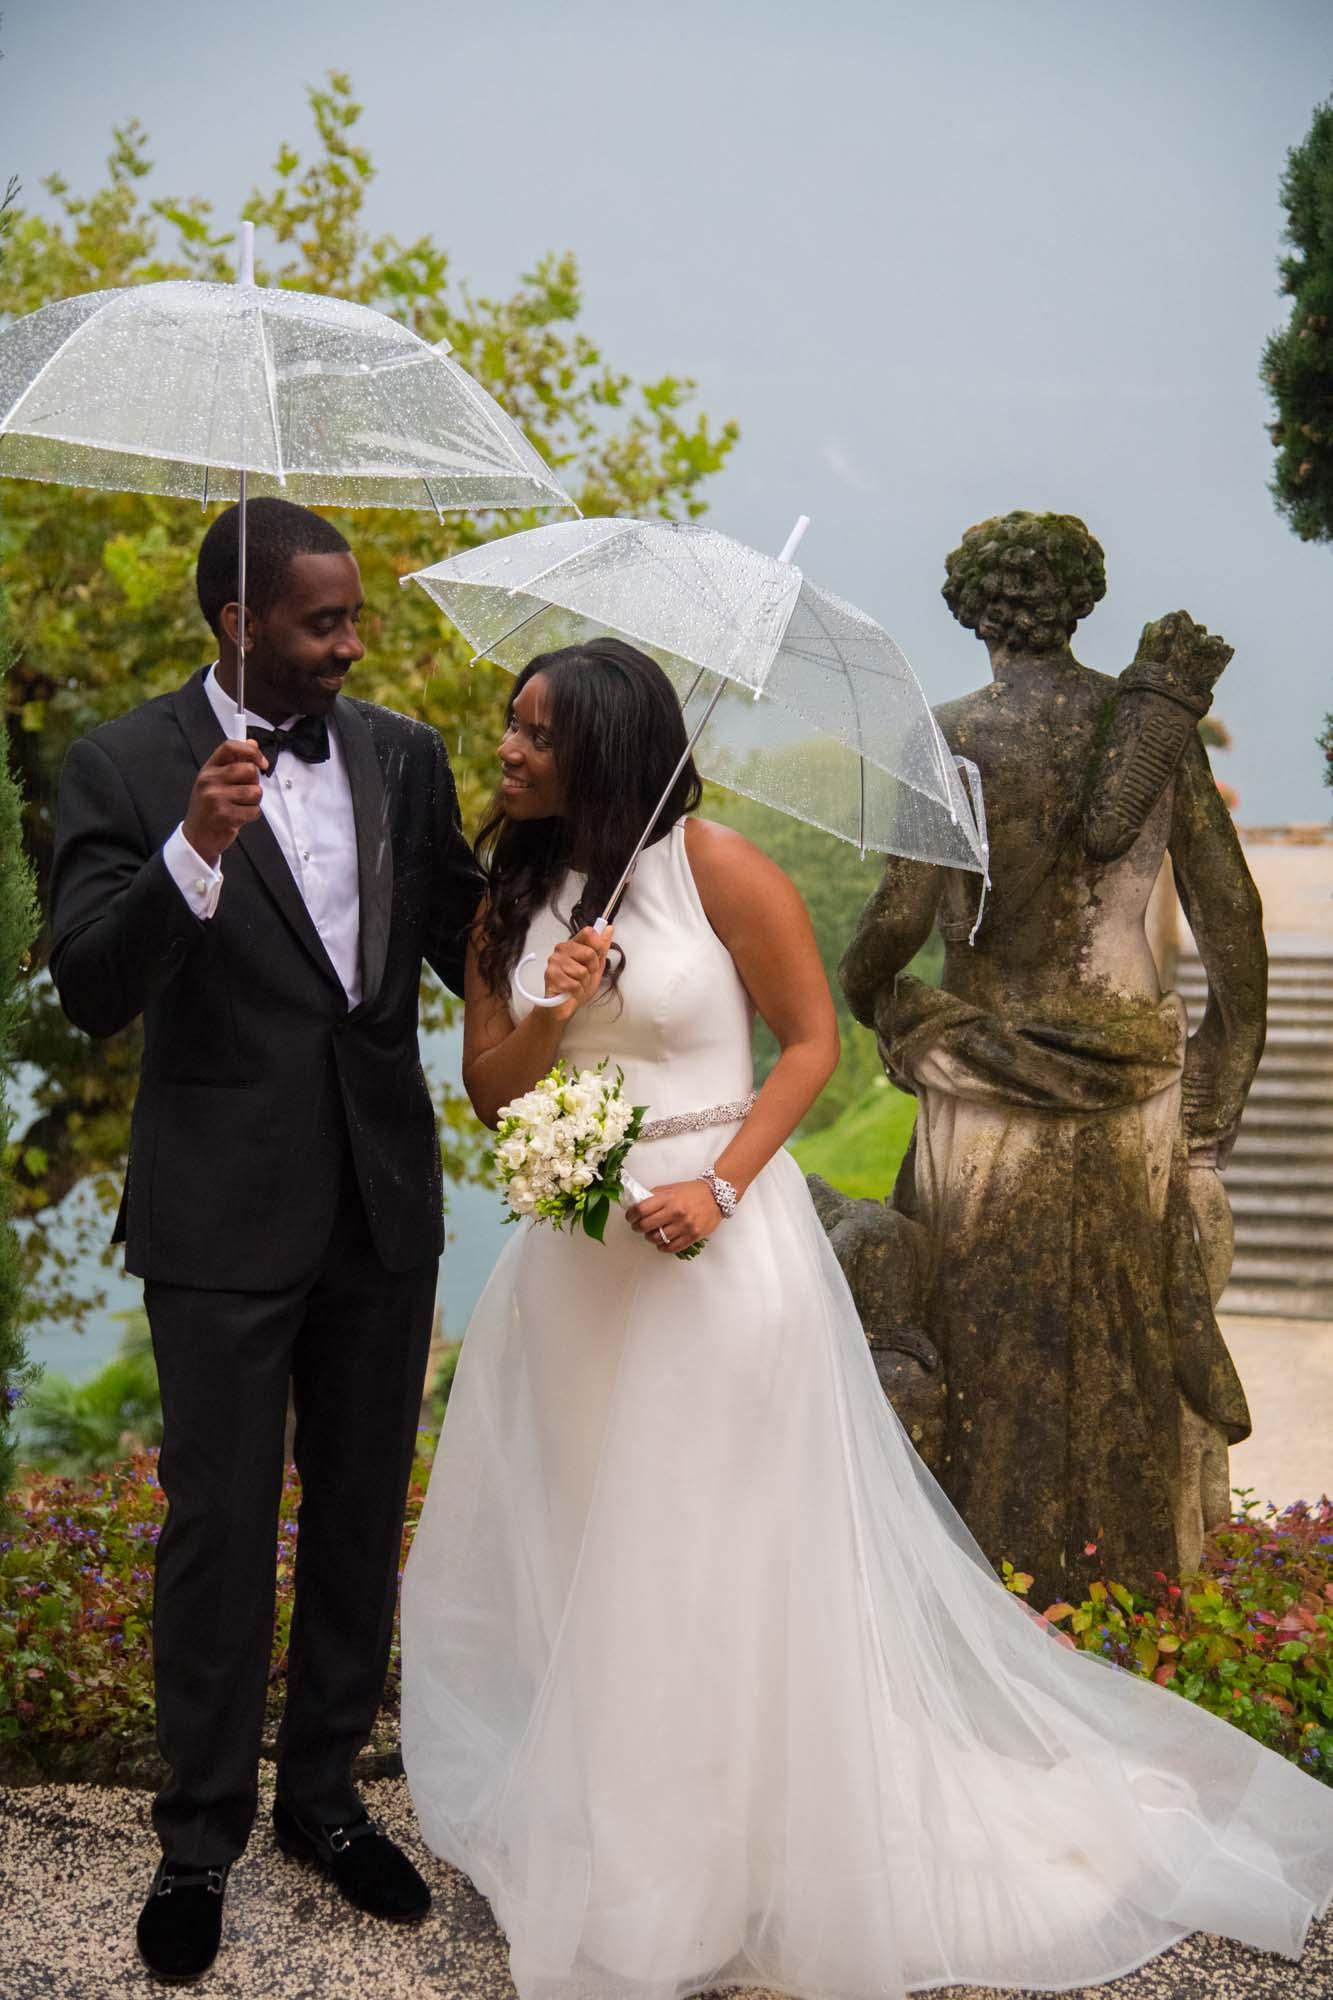 Lake-Como-Italy-Wedding-Jamie-Levine-Photography-22.jpg